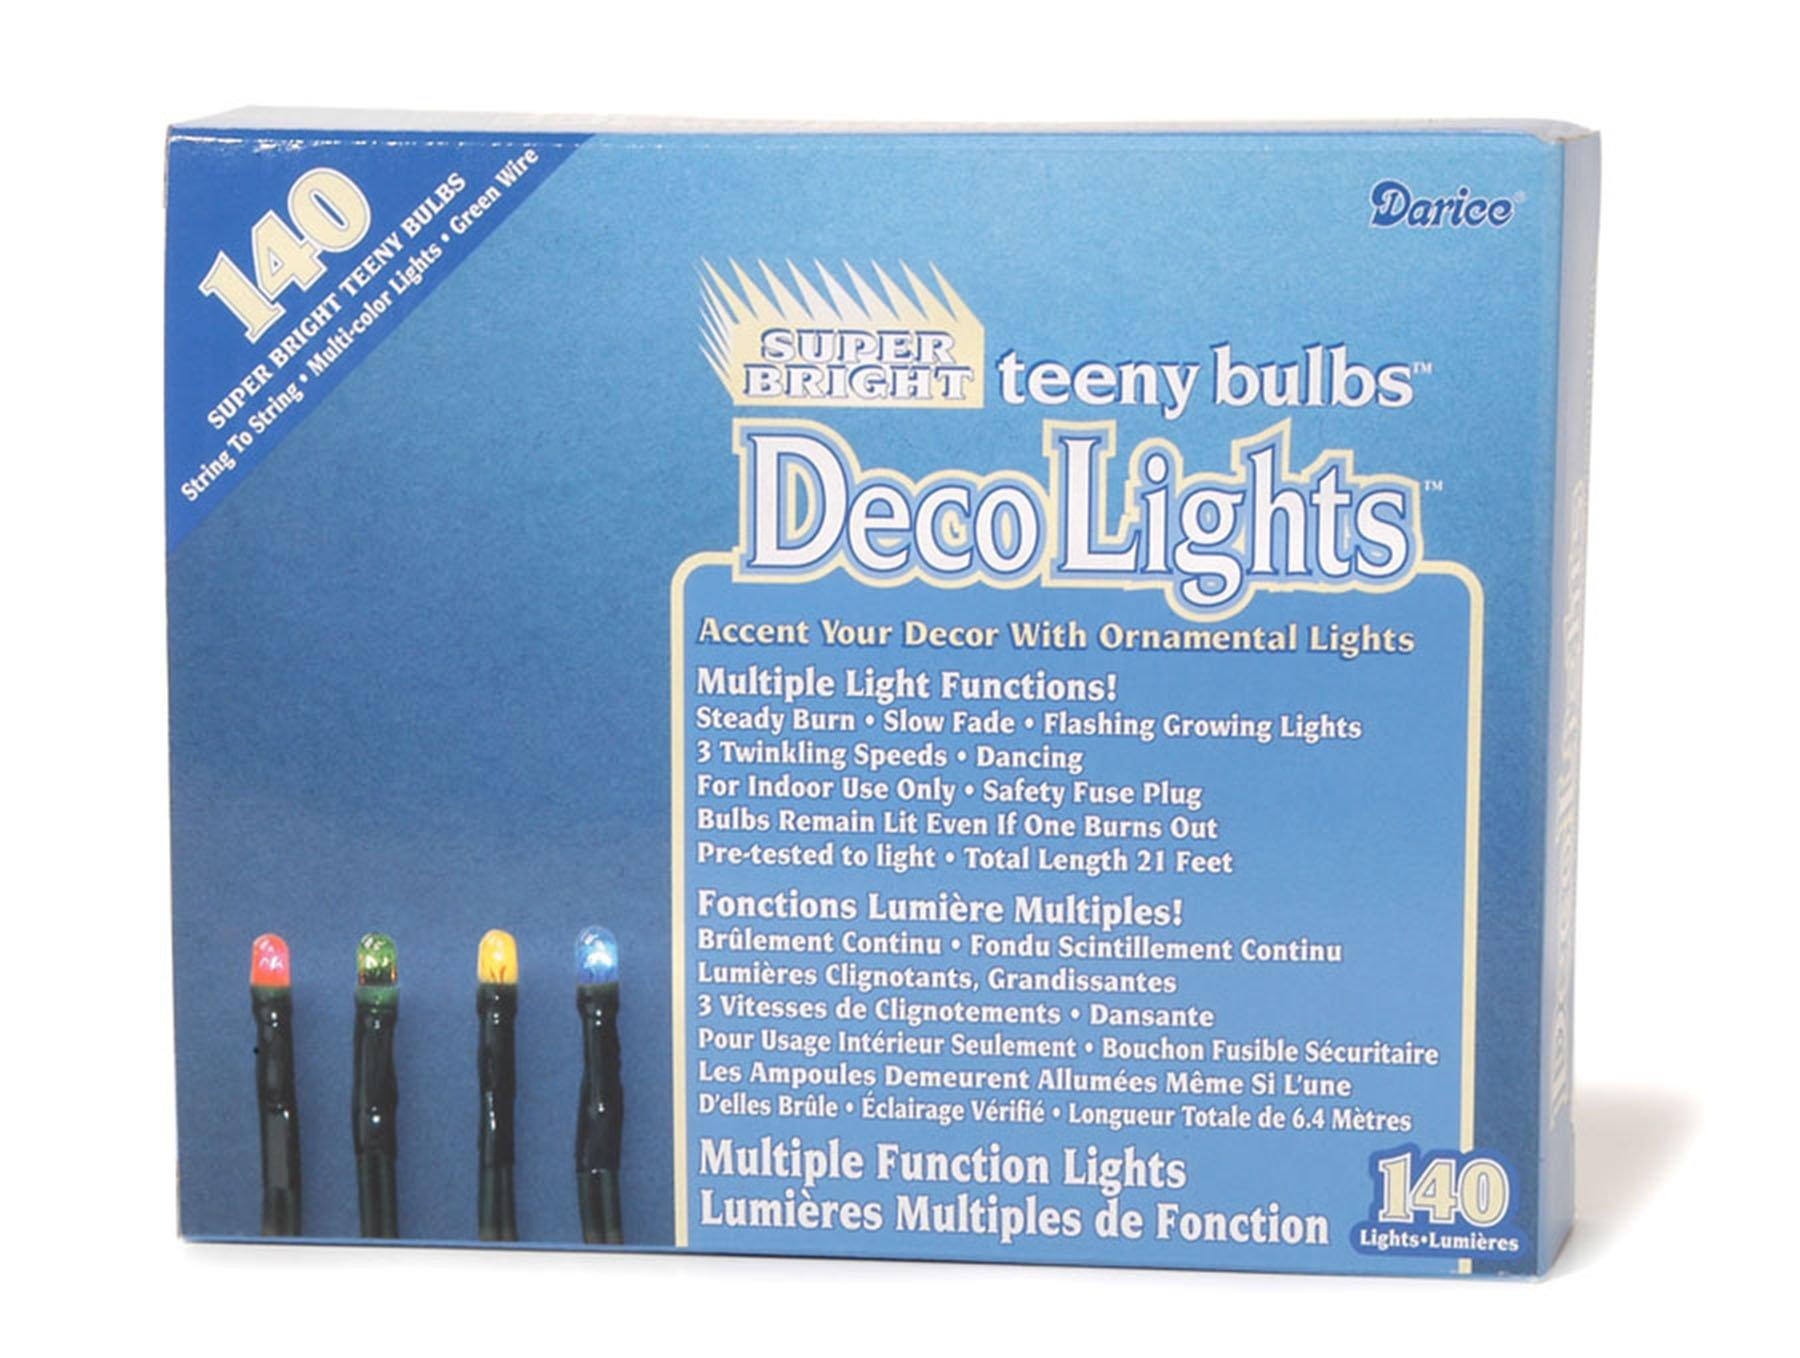 Amazon.com: Darice DecoLights Teeny Bulbs Multi Function Clear with ...